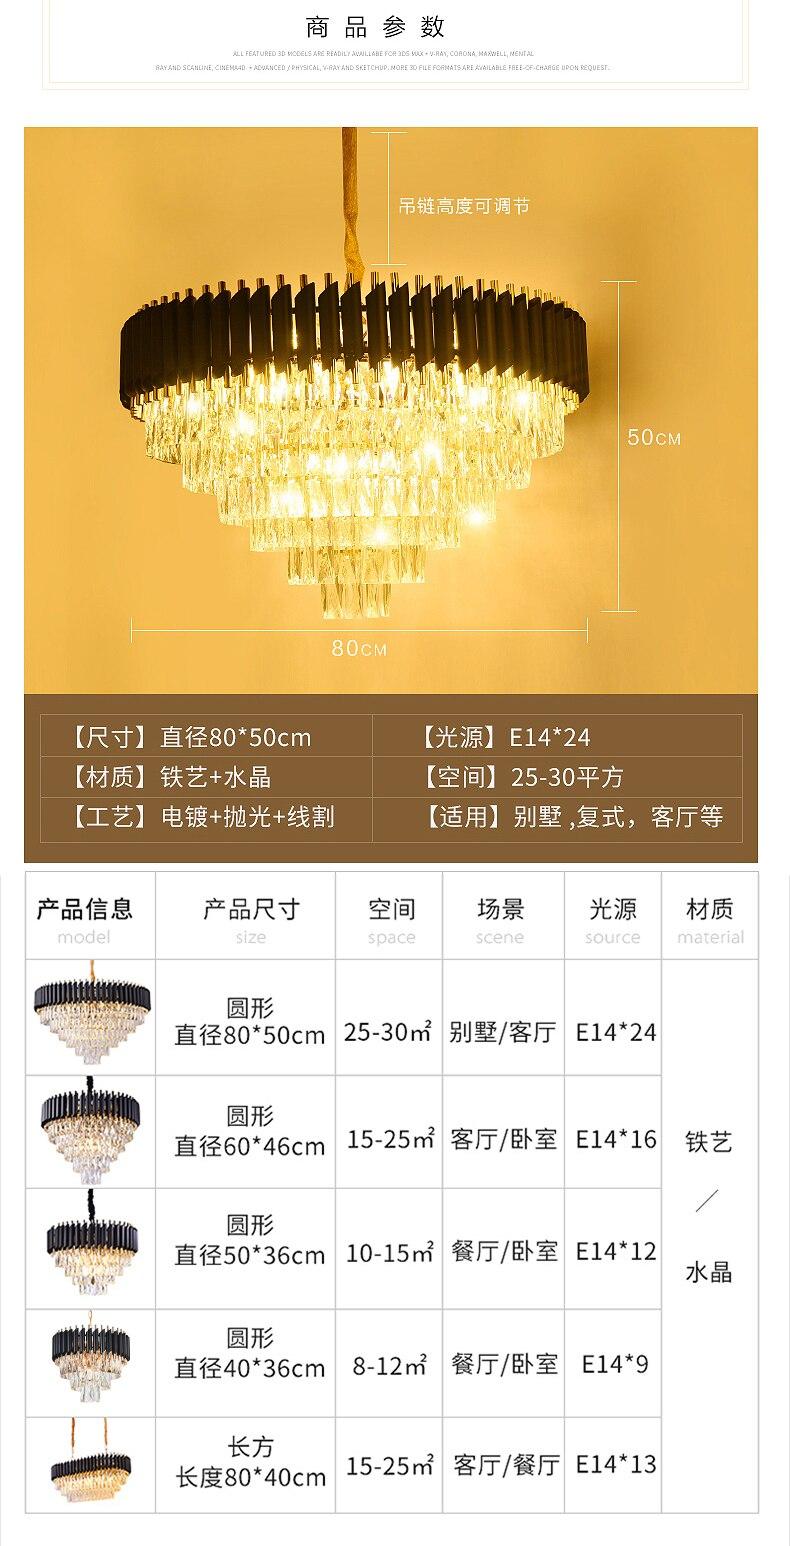 HTB1ZSRPbsnrK1RjSspkq6yuvXXaJ 2019 New Arrival Modern Crystal Pendant Lights 220V nordic light lamparas de techo colgante moderna for Living room parlor study